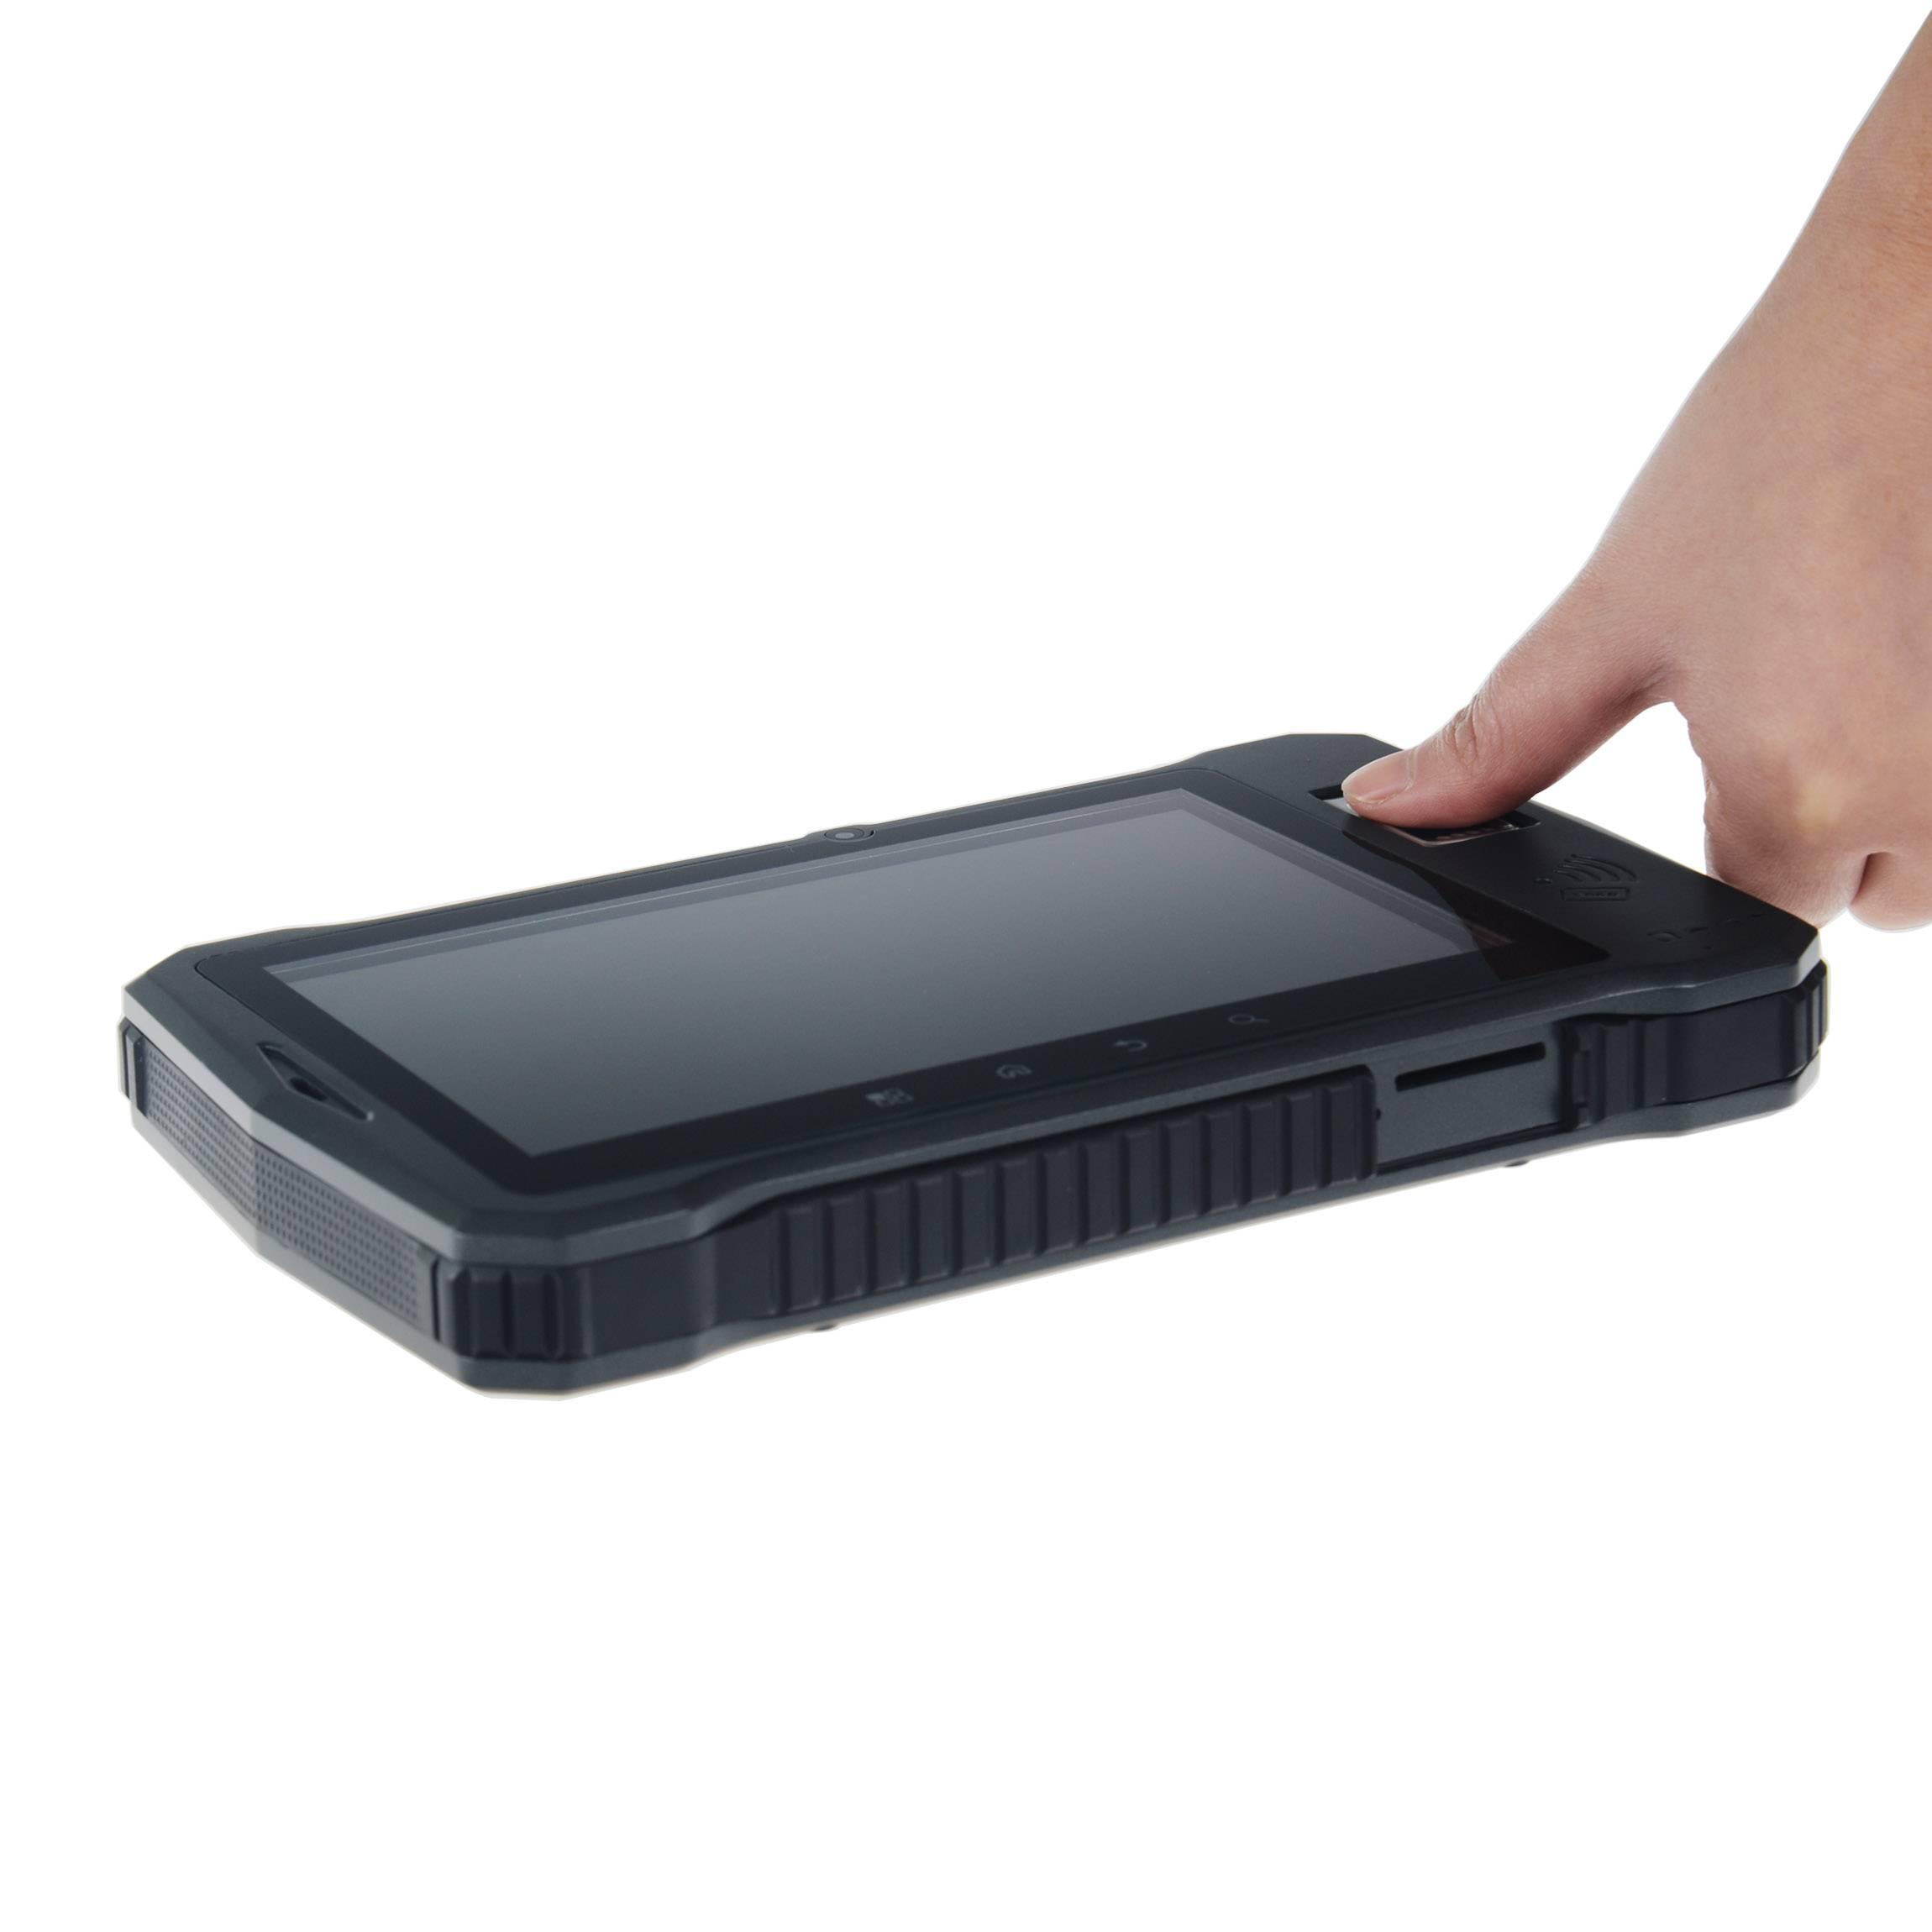 A370 Fingerprint reader,Android Tablet PC